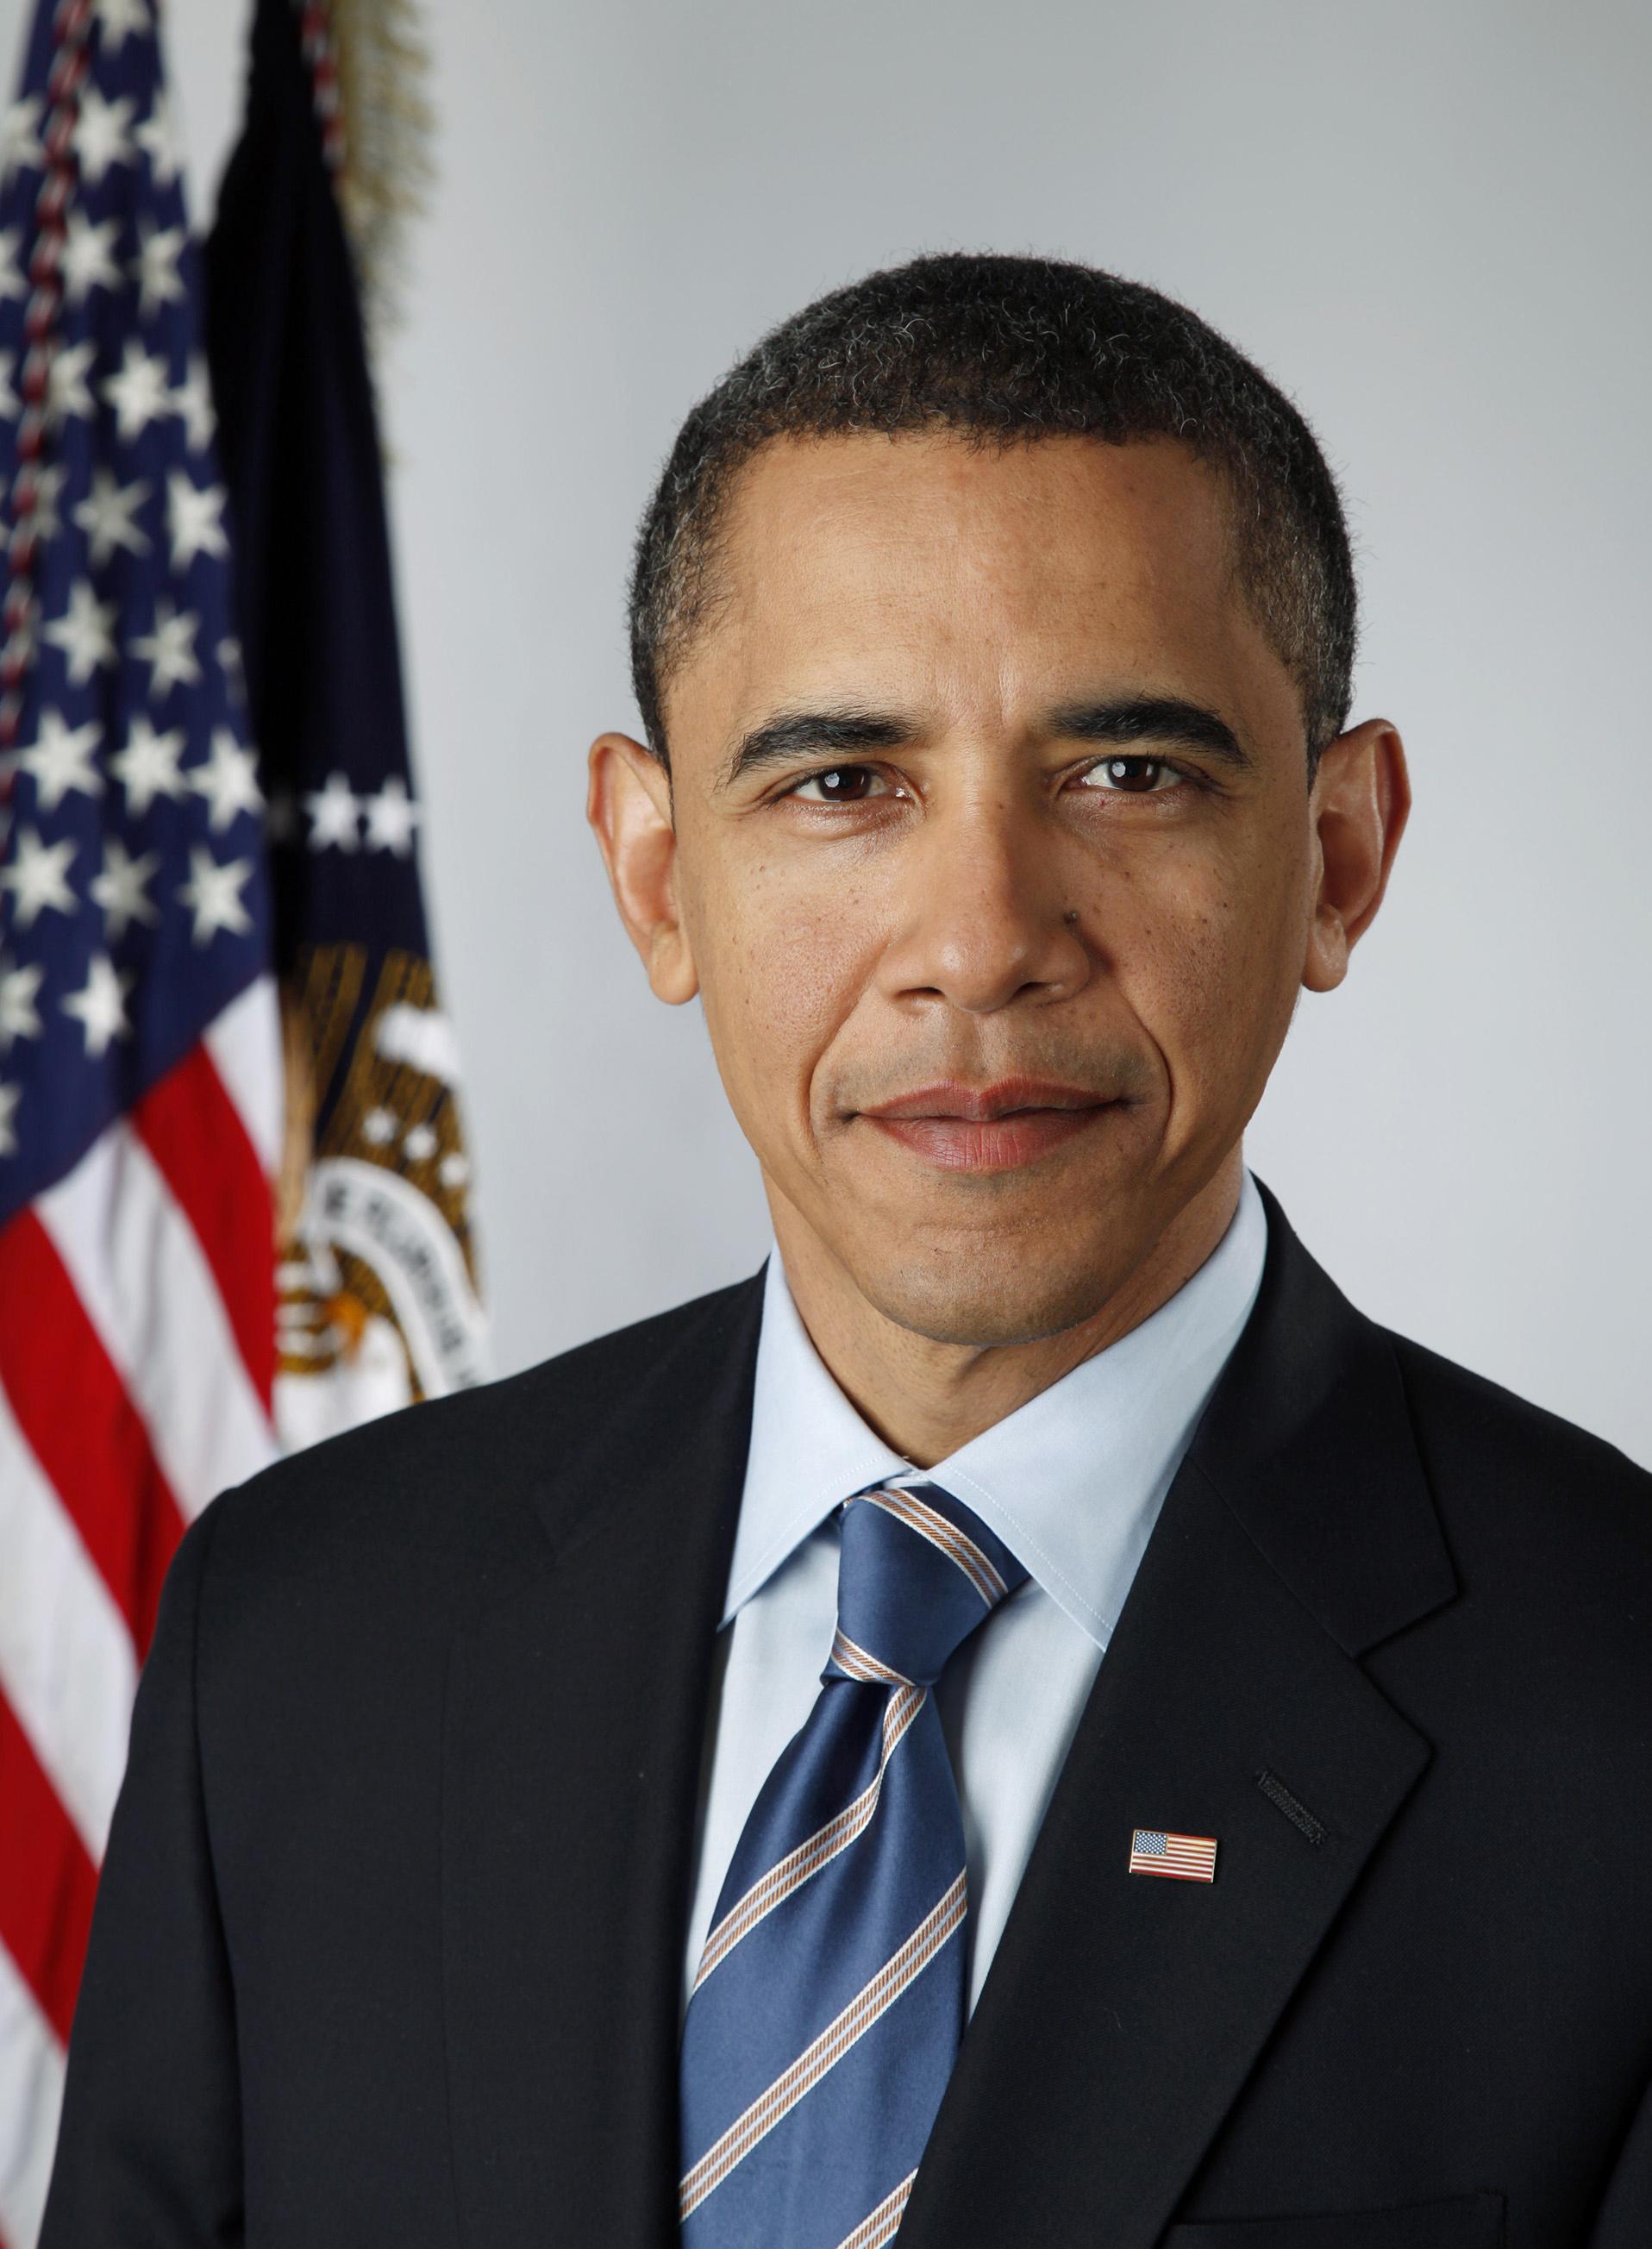 Obama 2022 - Copy - Copy (2).jpg